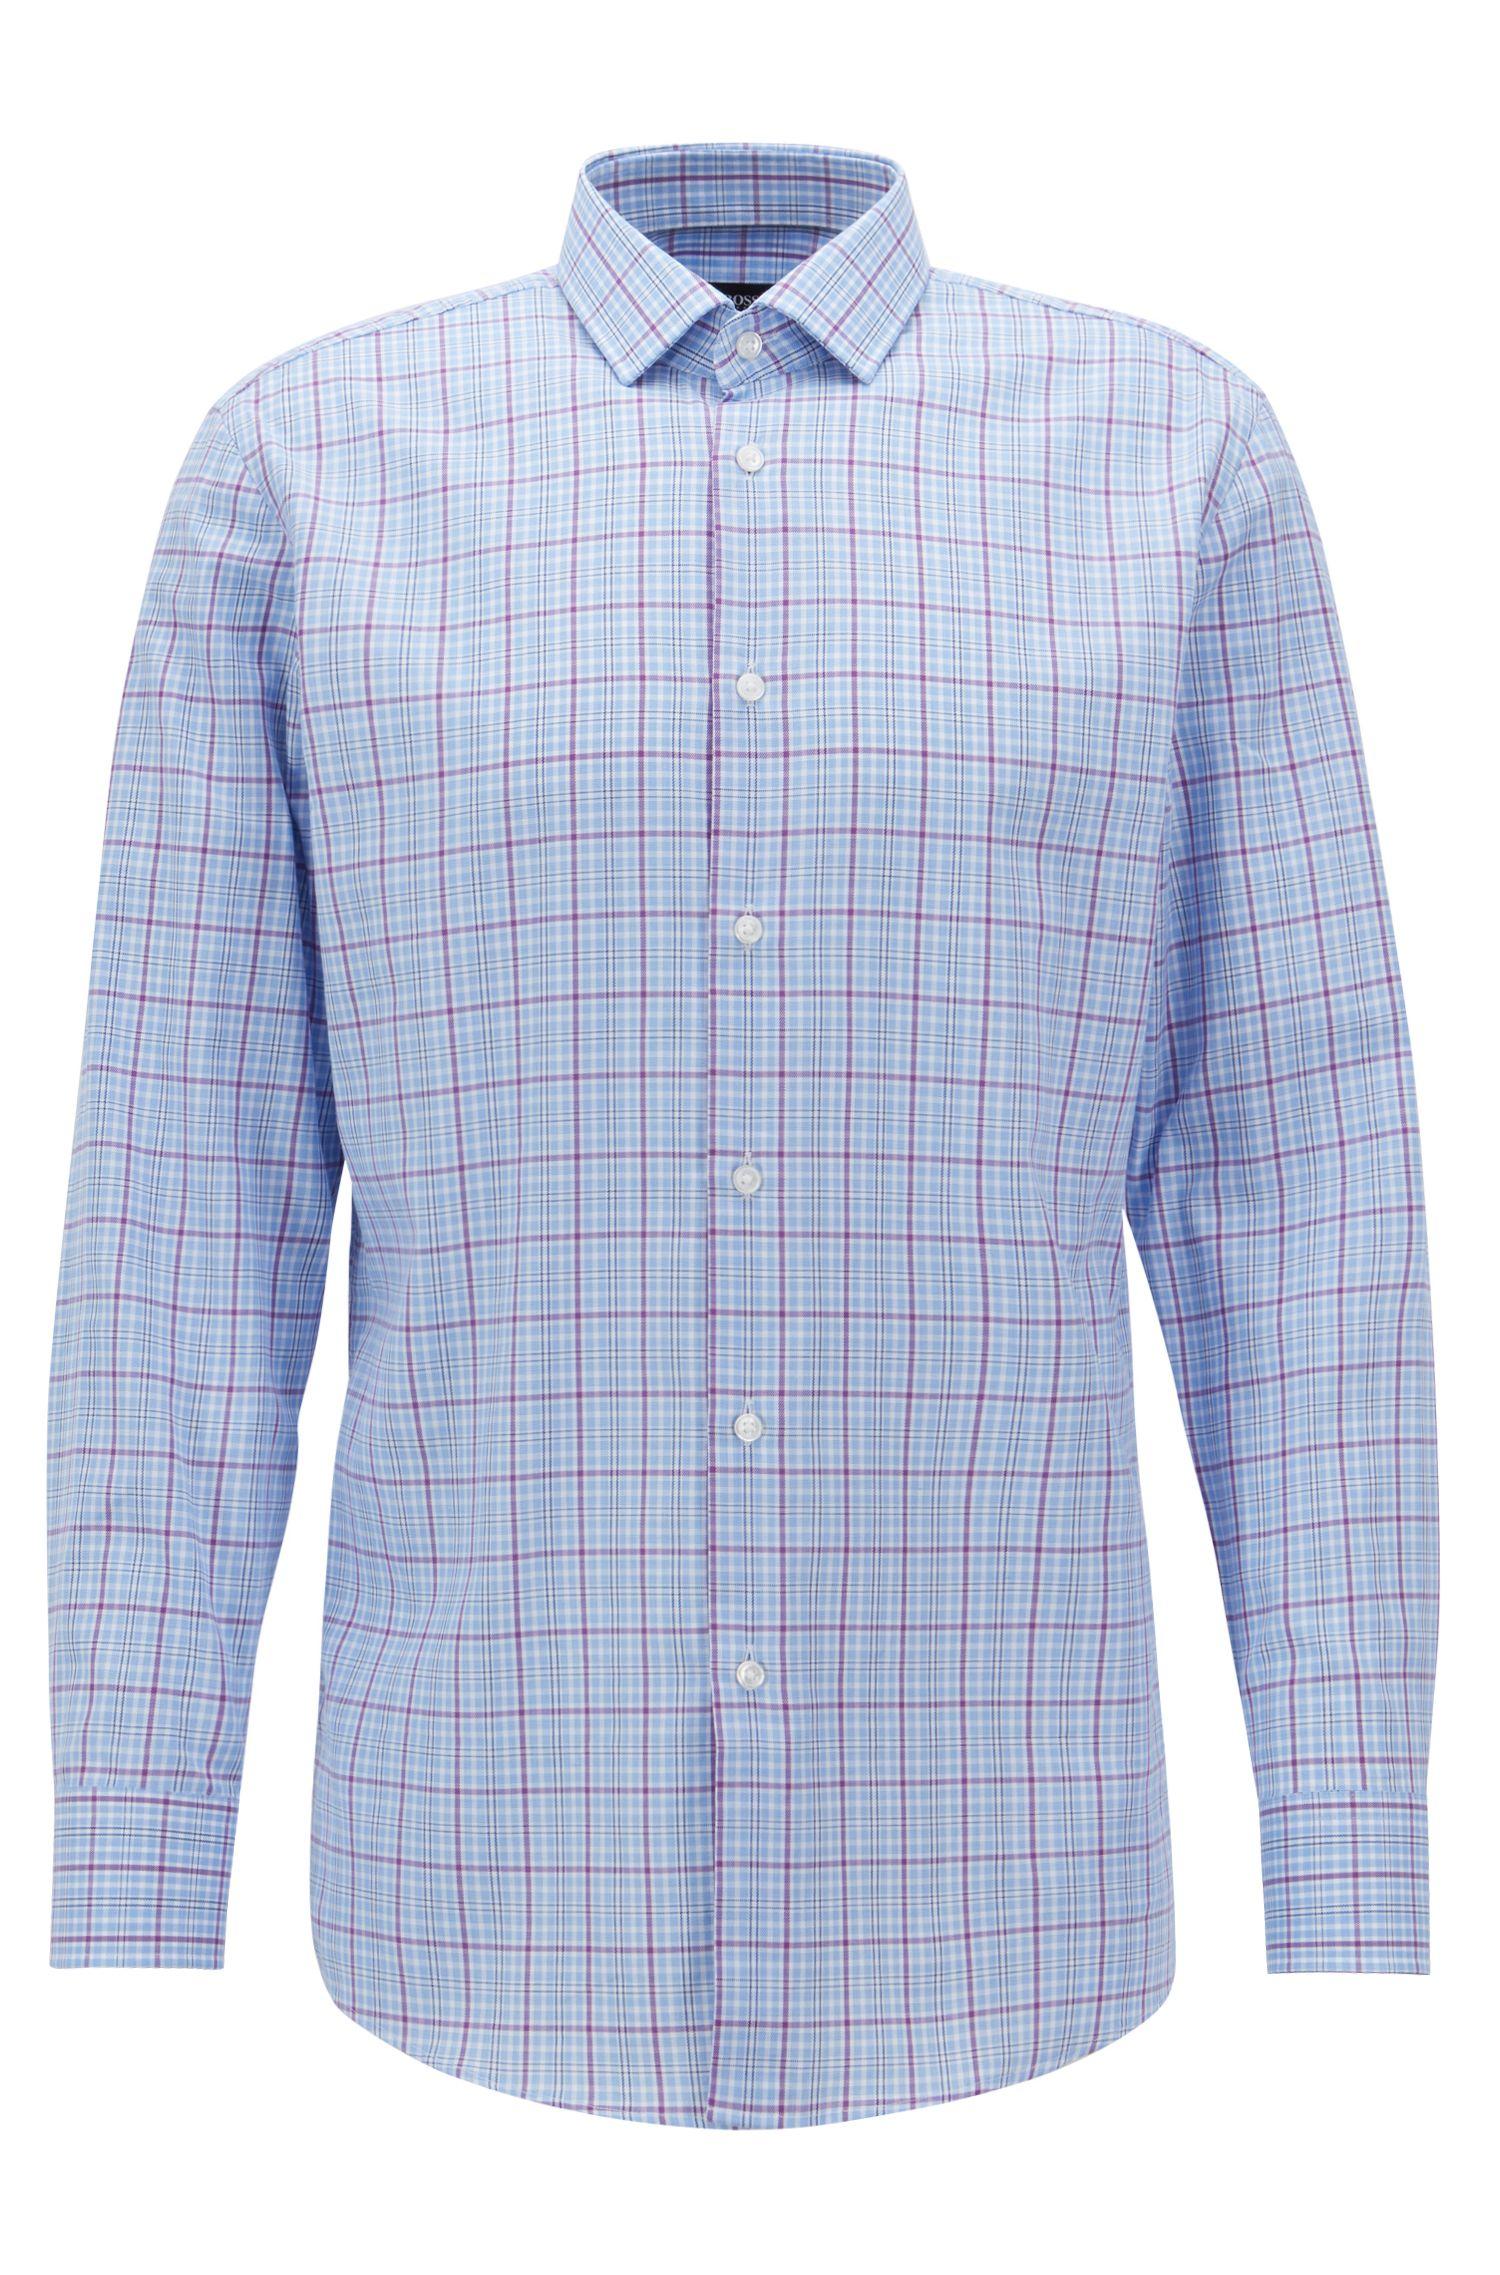 Slim-fit shirt in plain-check cotton twill, Dark pink